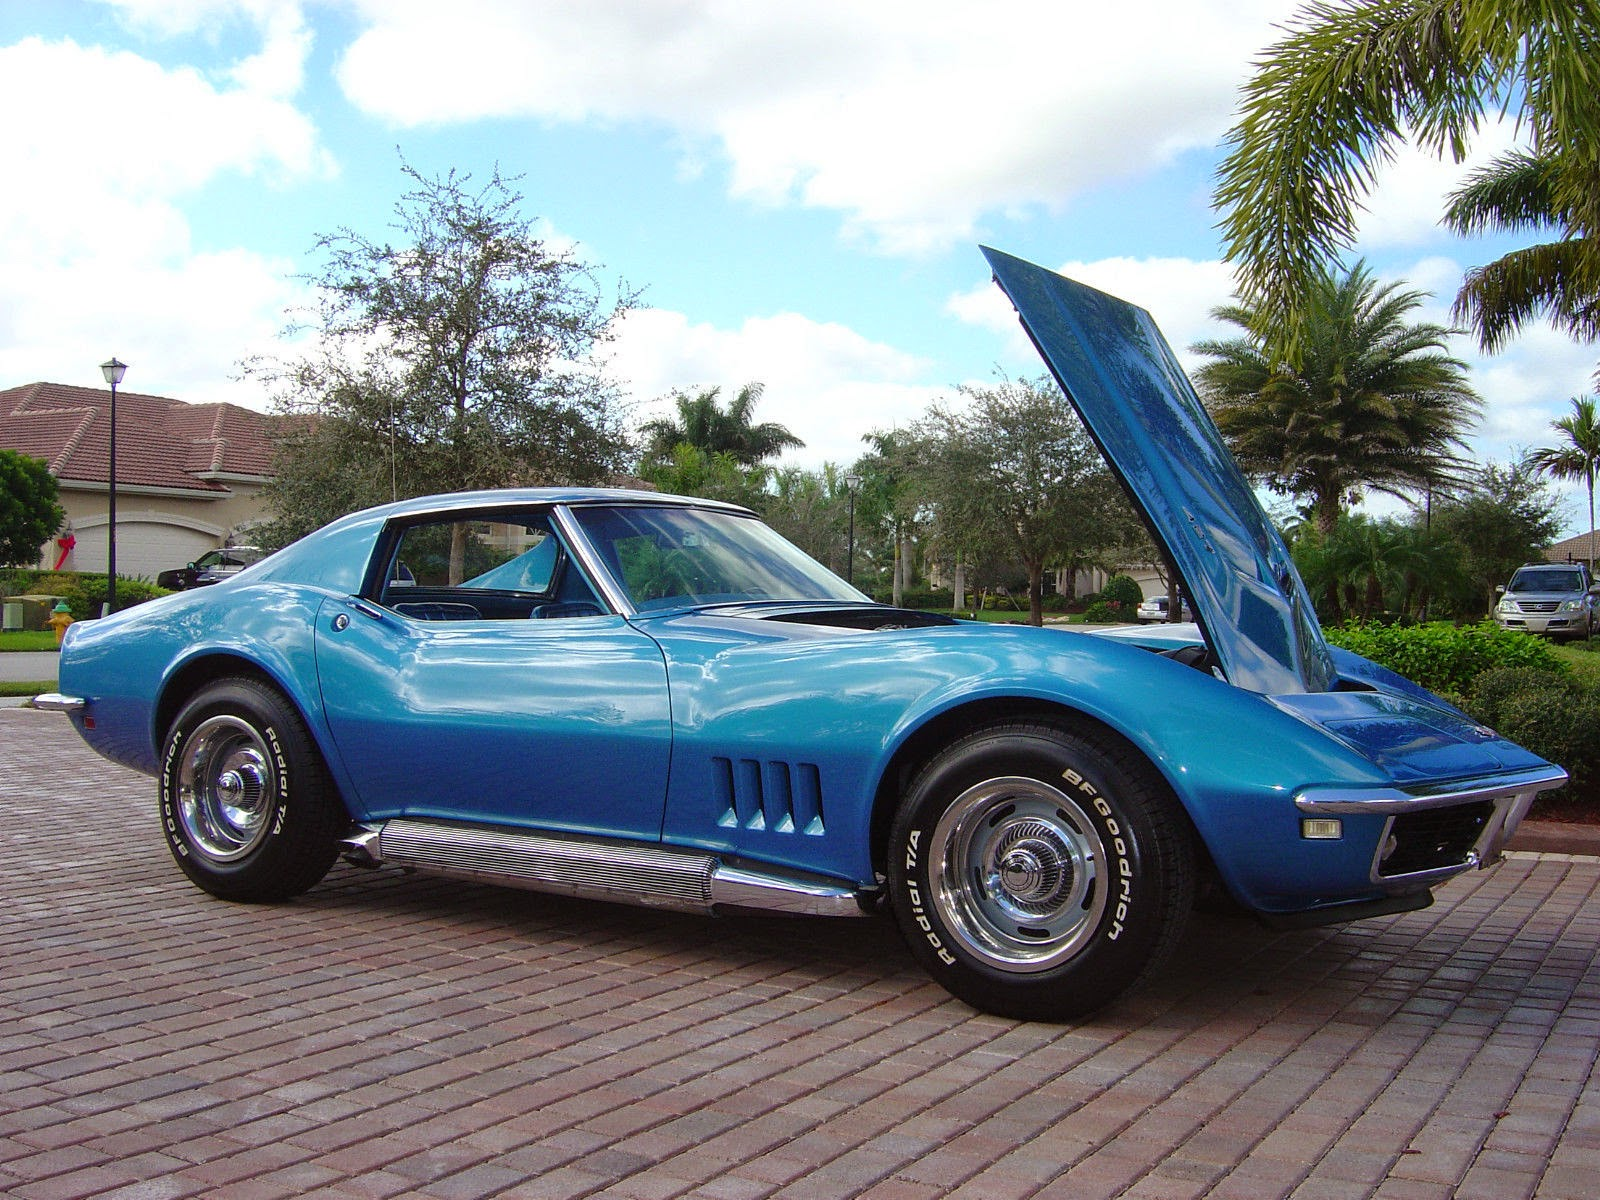 1968 chevrolet corvette 427 435 hp restored for sale for American restoration cars for sale